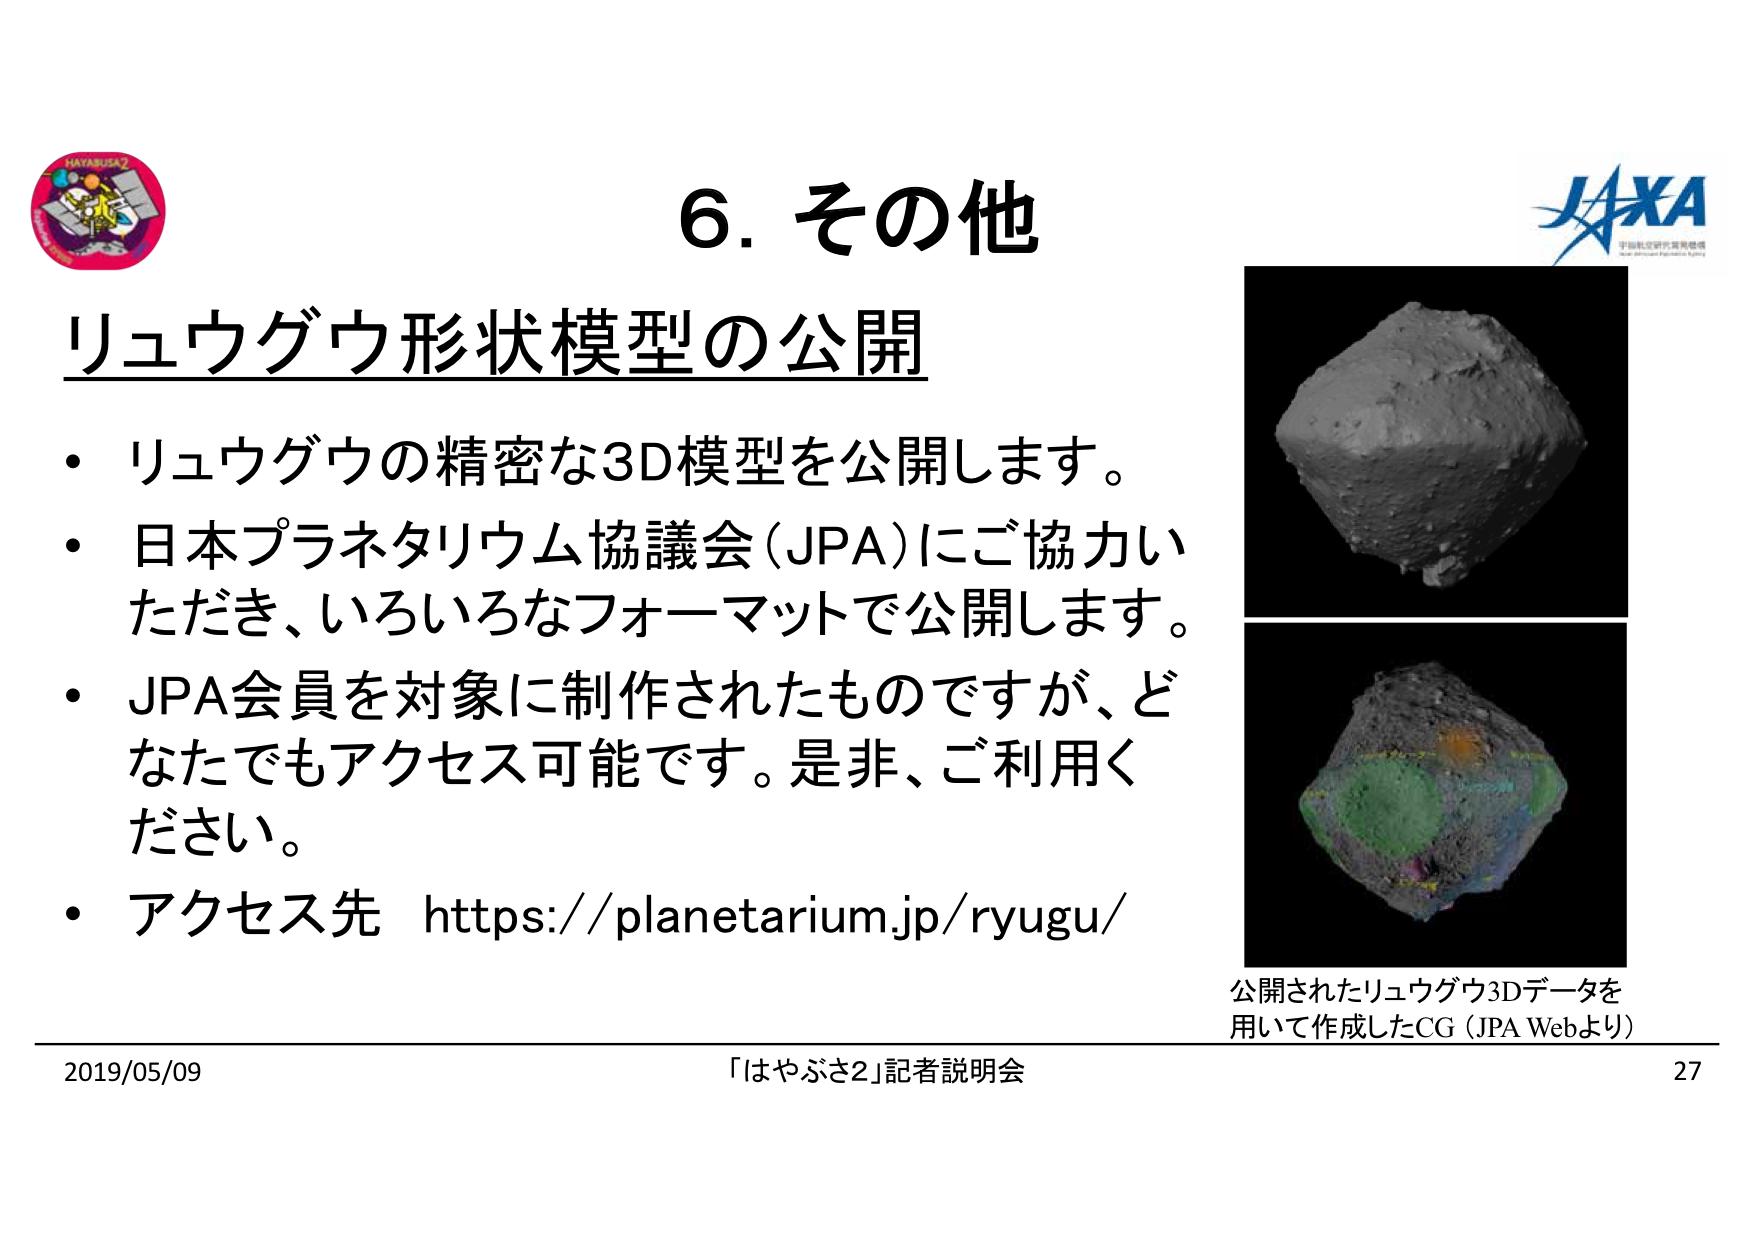 f:id:Imamura:20190509154423p:plain